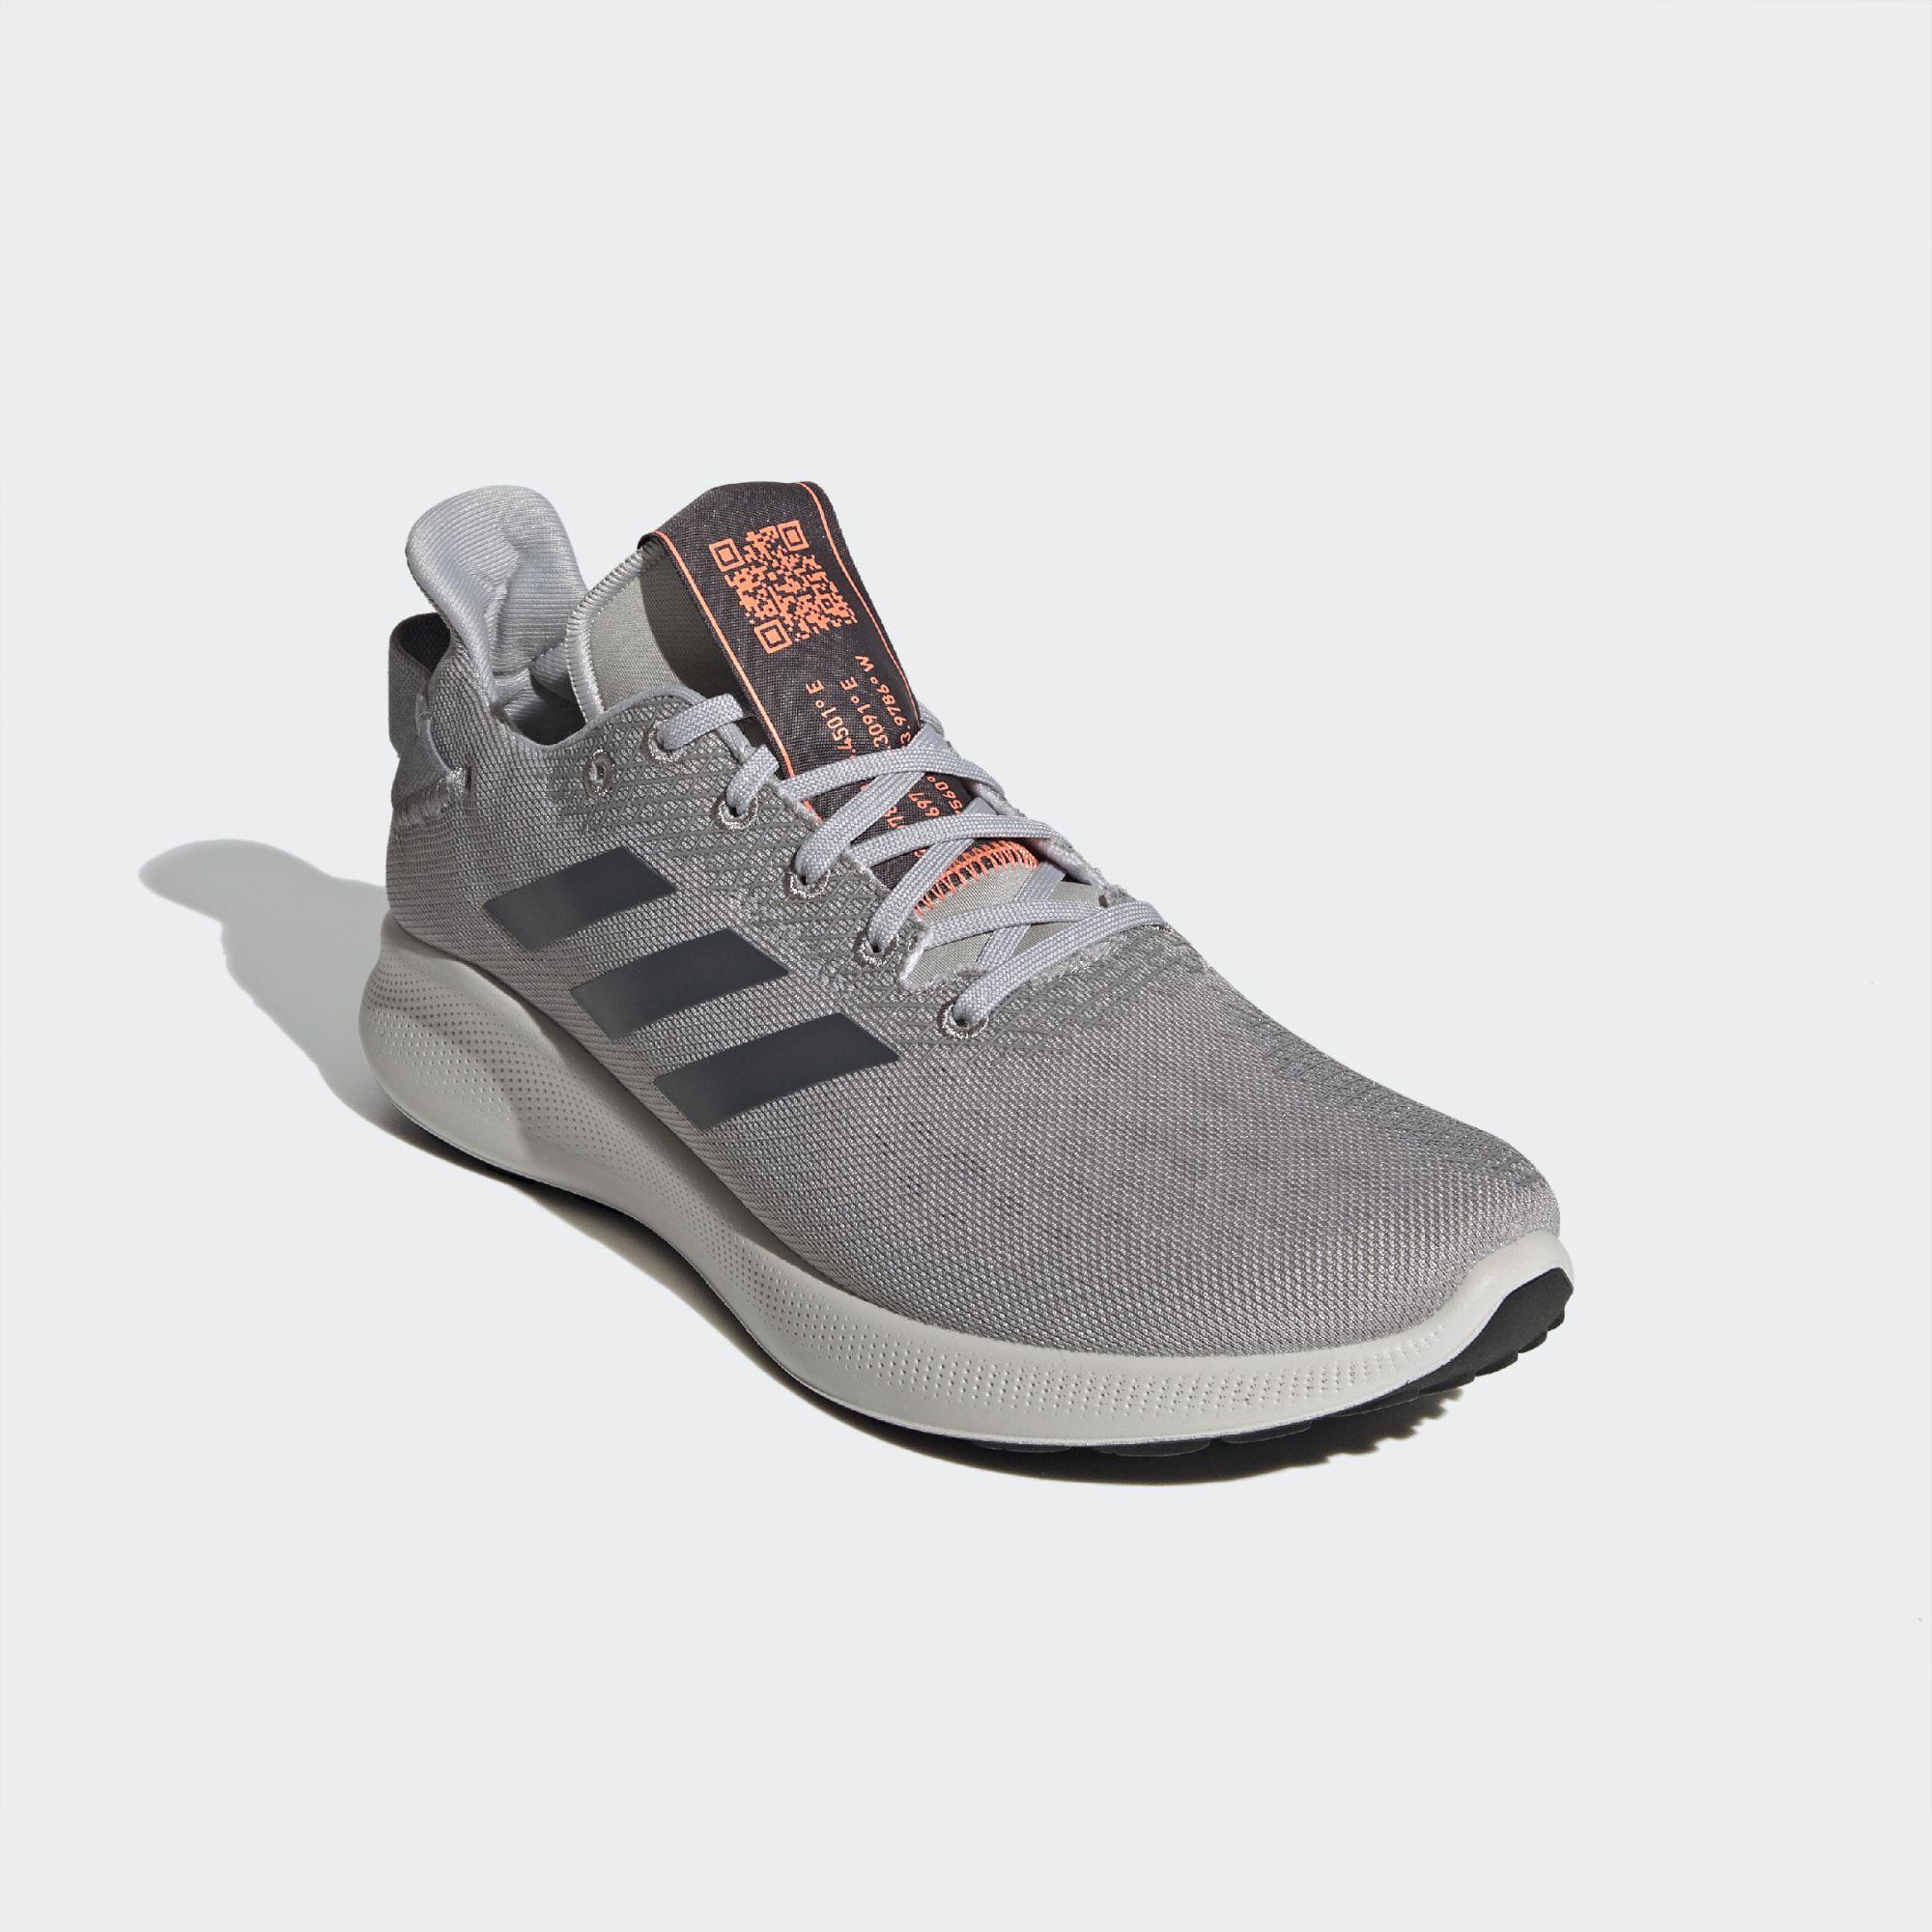 Tênis Adidas Sensebounce + Street